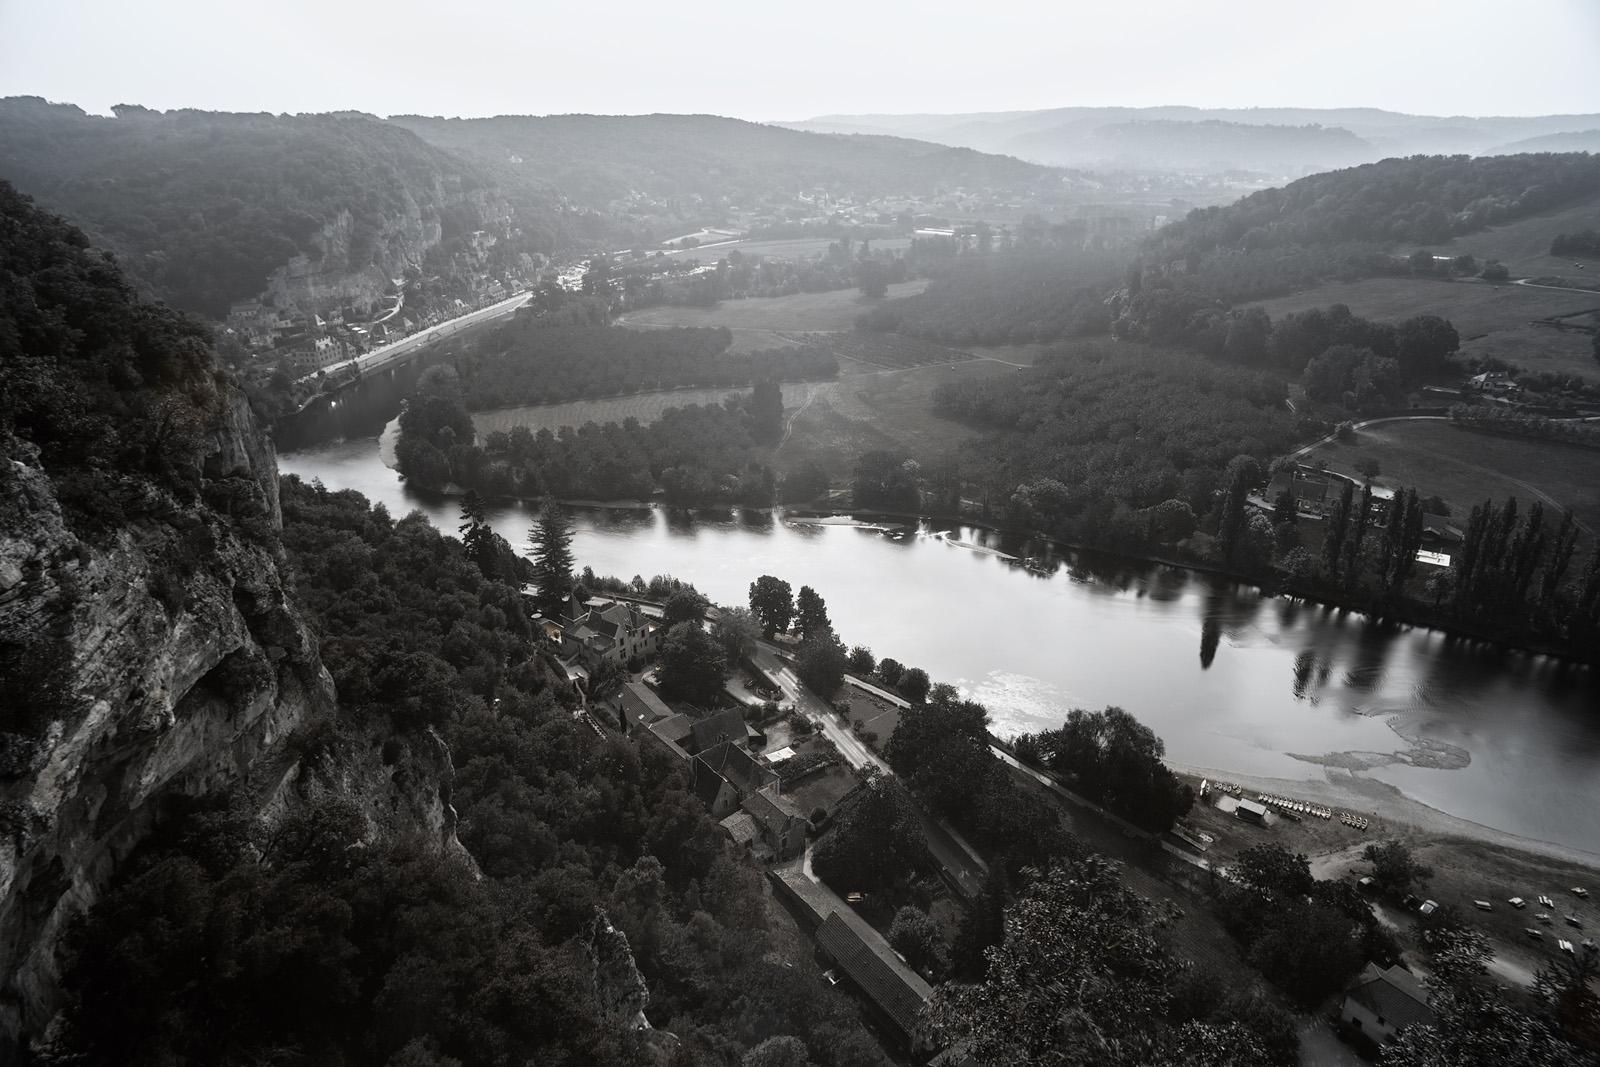 dordogne_ultraviolet_panorama_UV_paysage_campagne_pierre-louis_ferrer_photographe